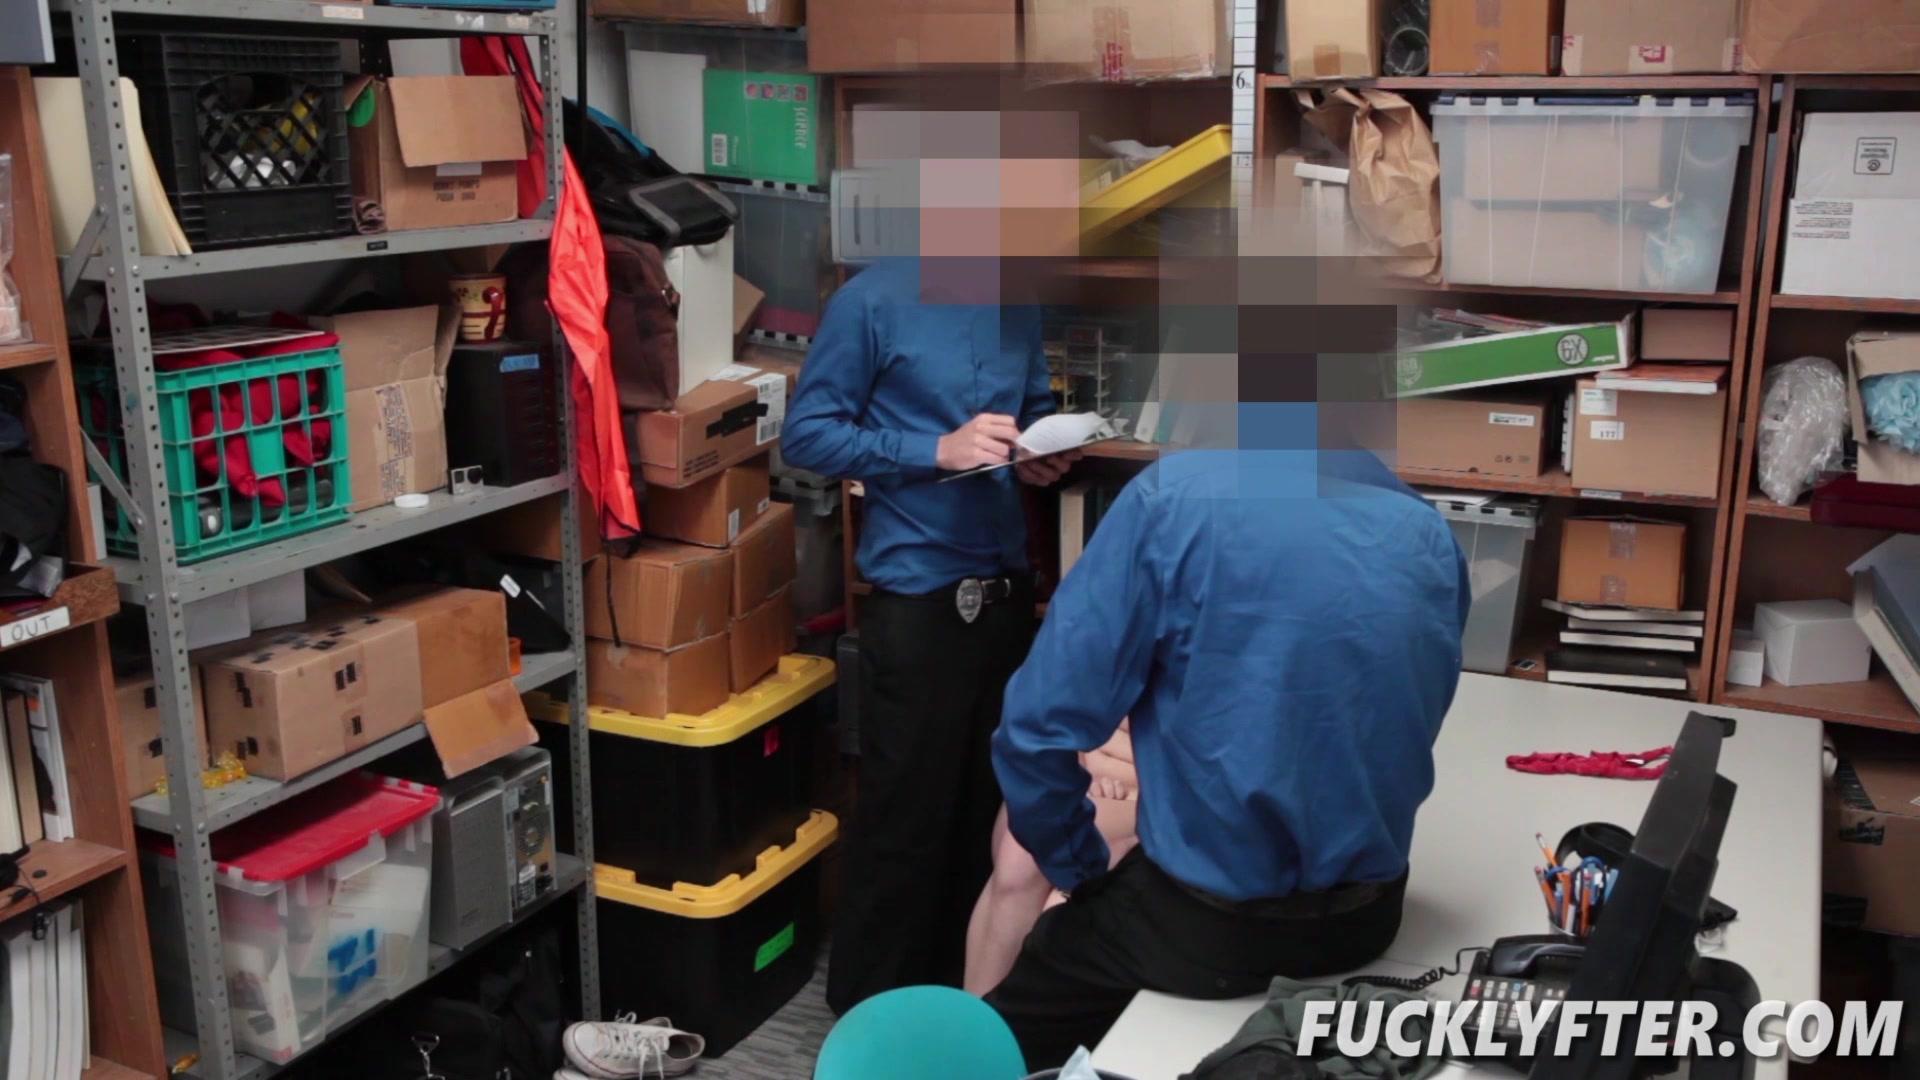 Porn pictures Craigslist western mass personals